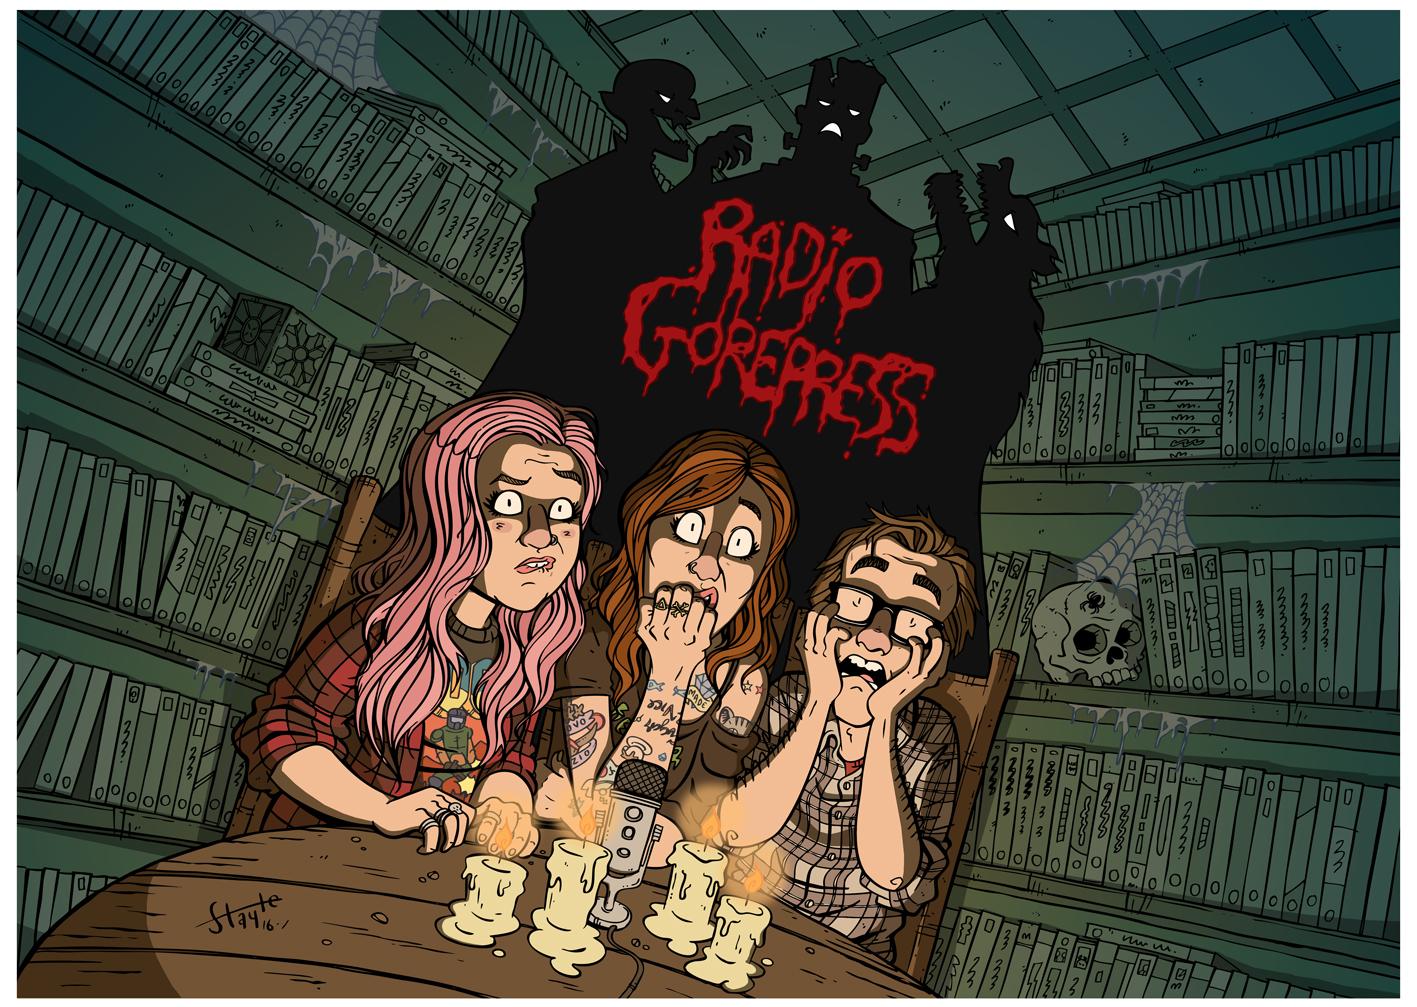 Radio Gorepress Podcast.